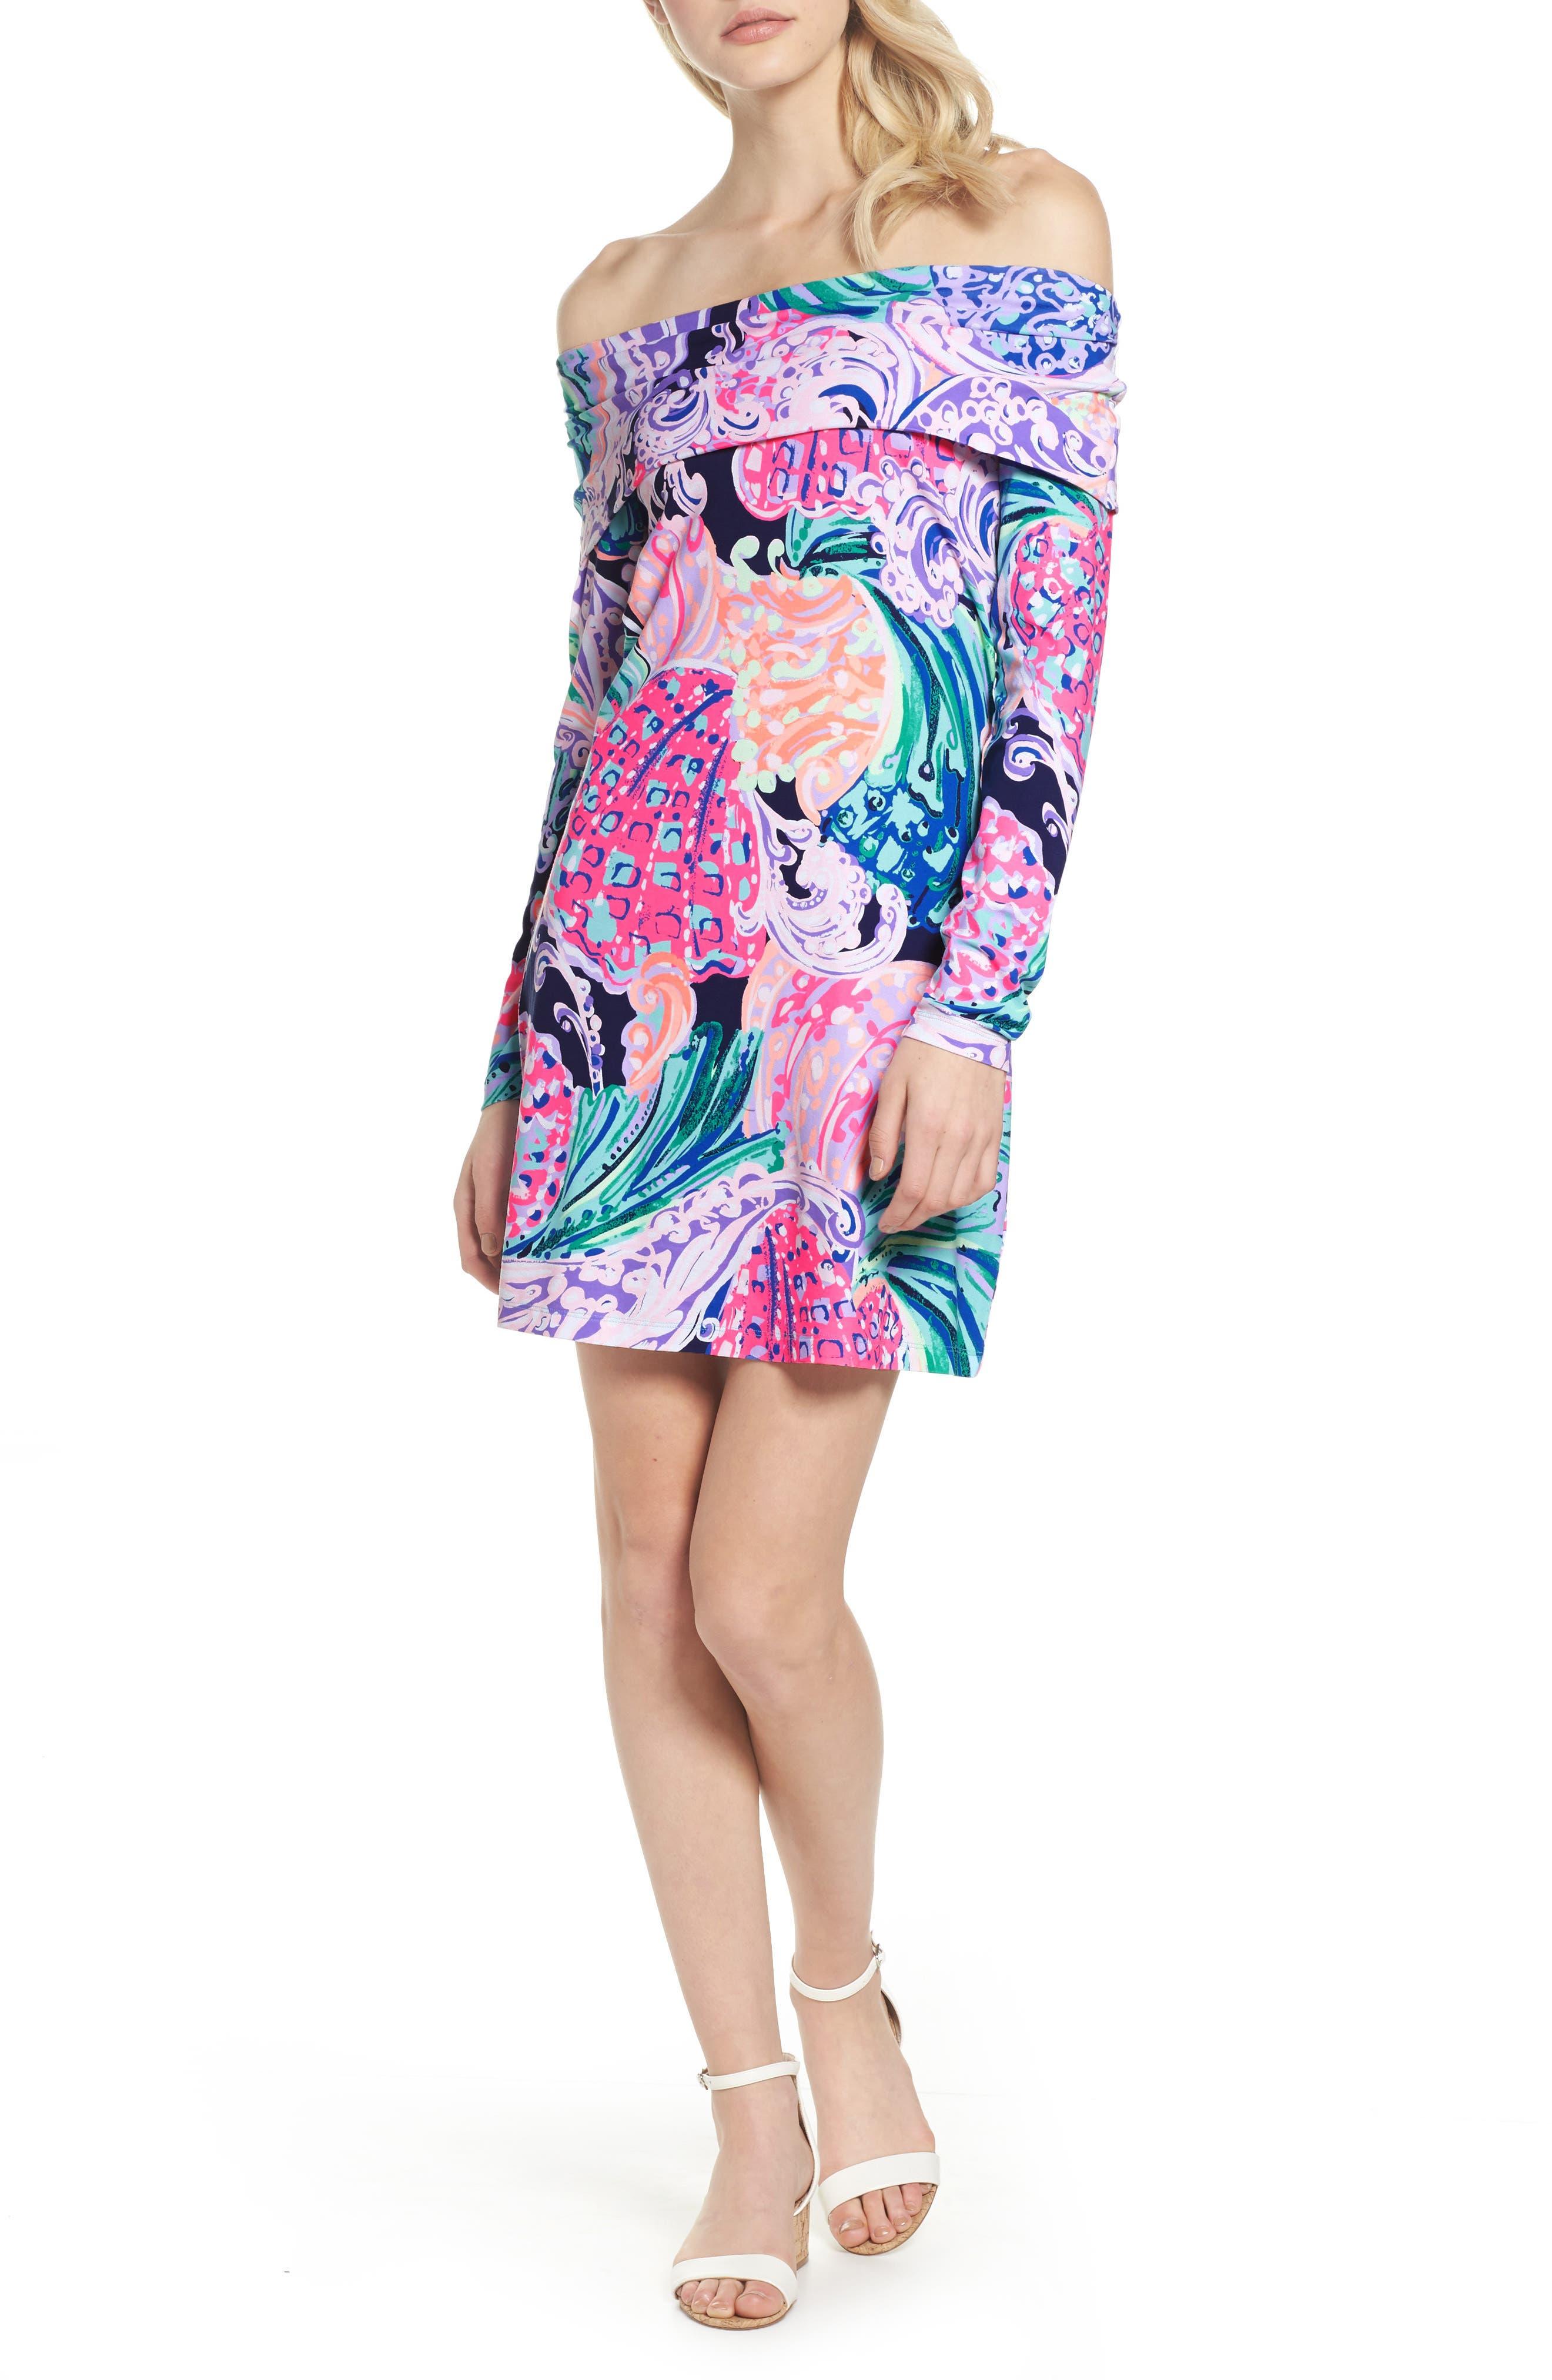 Trisha Off the Shoulder Dress,                         Main,                         color, Multi All That She Wants